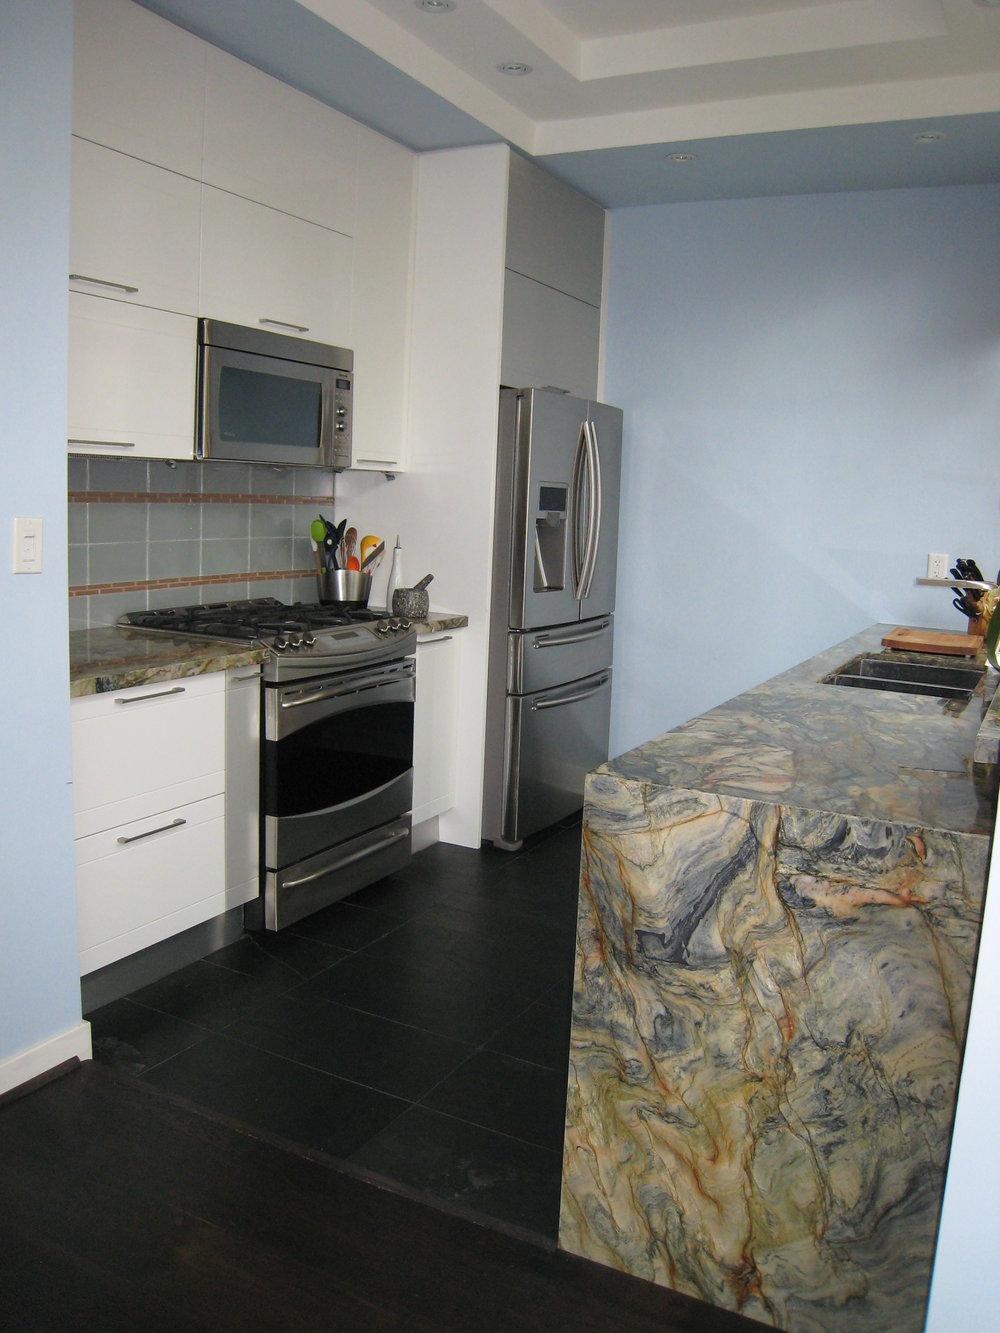 Kitchen 5 Pic 1.JPG